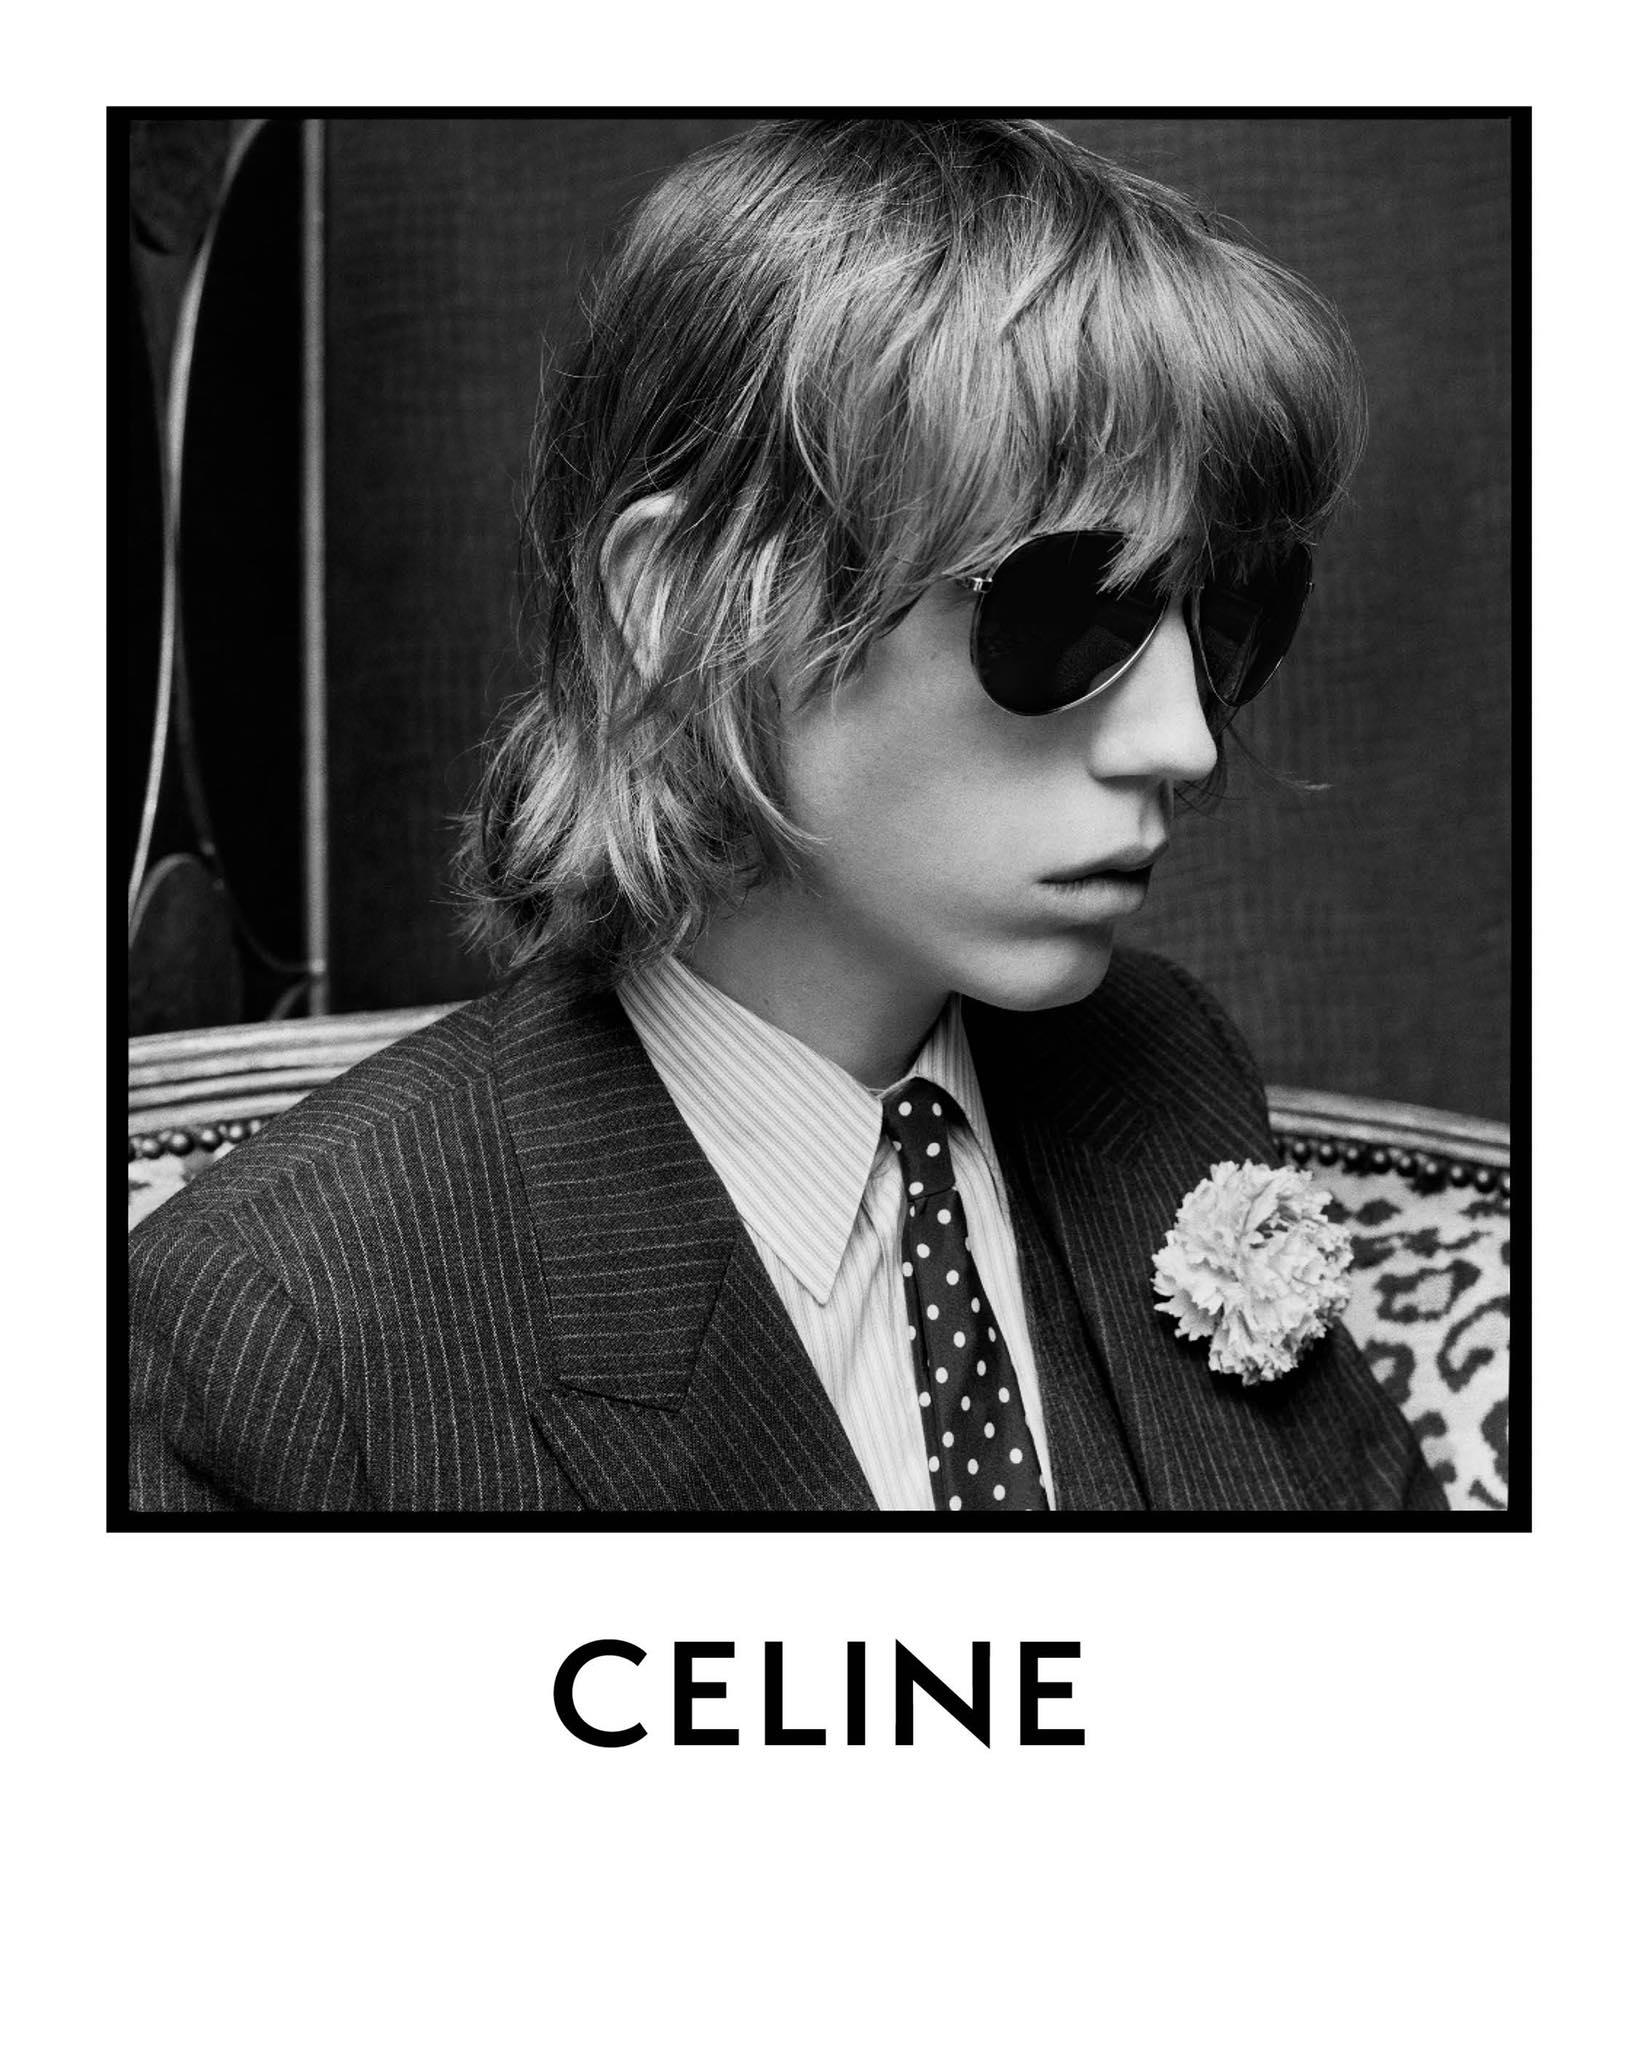 Celine Spring 2020 Men's Ad Campaign Photos